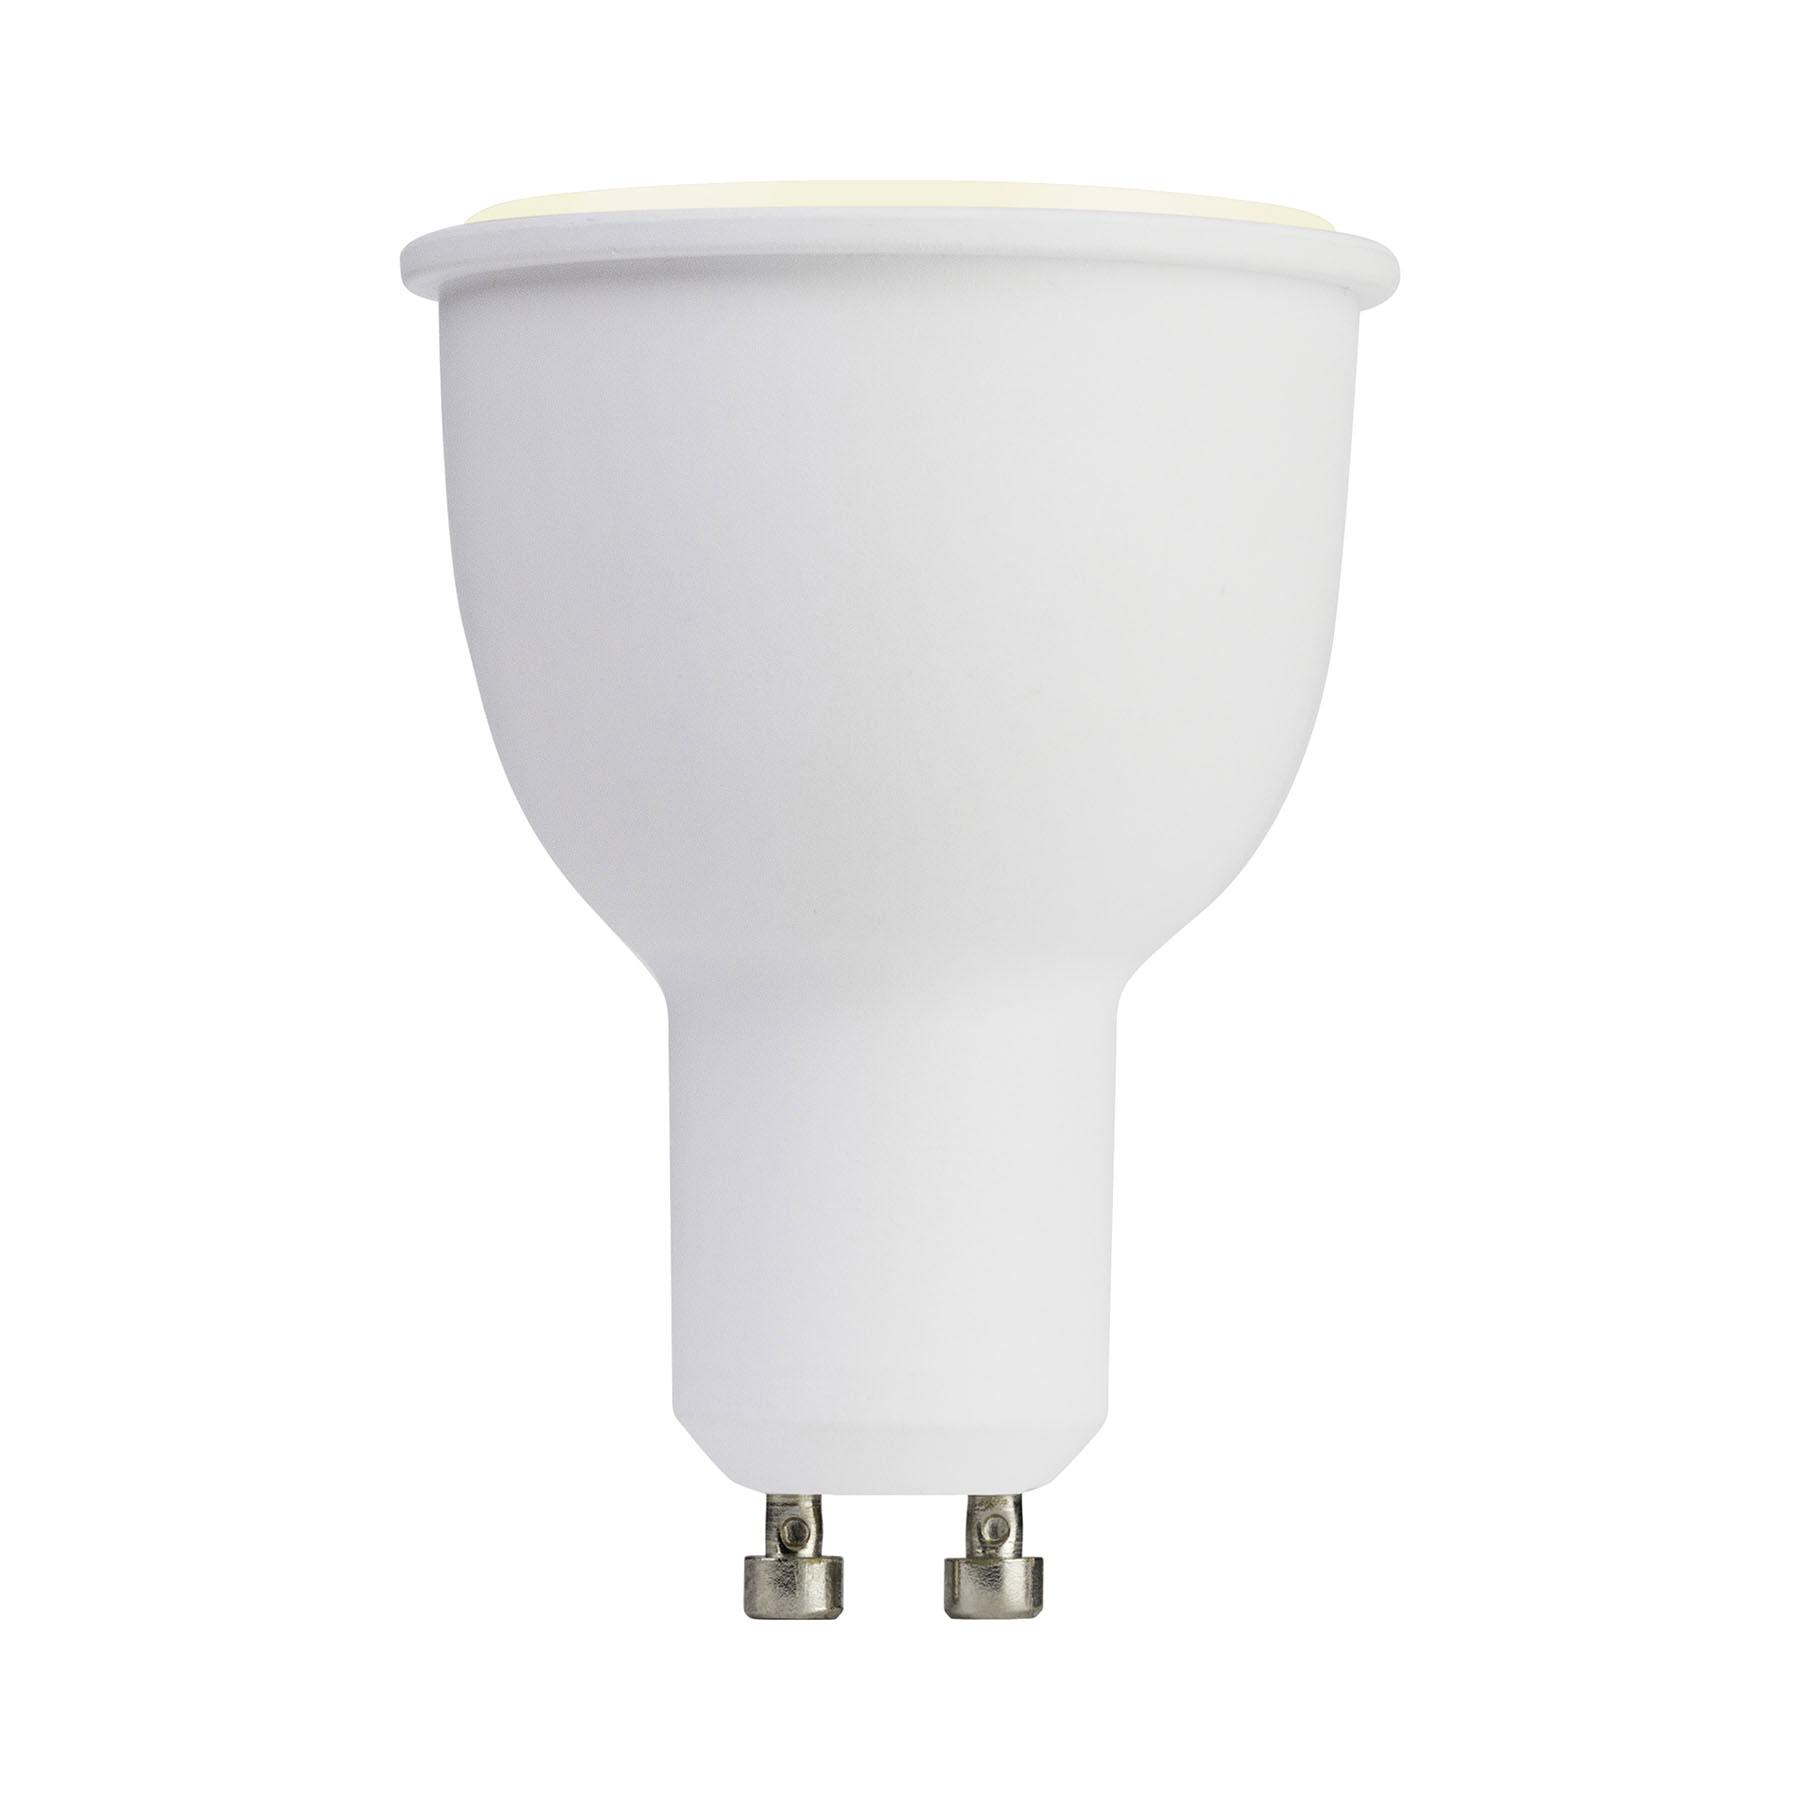 4 5watt smart gu10 led 2pin twist lock colour changing wifi bulb